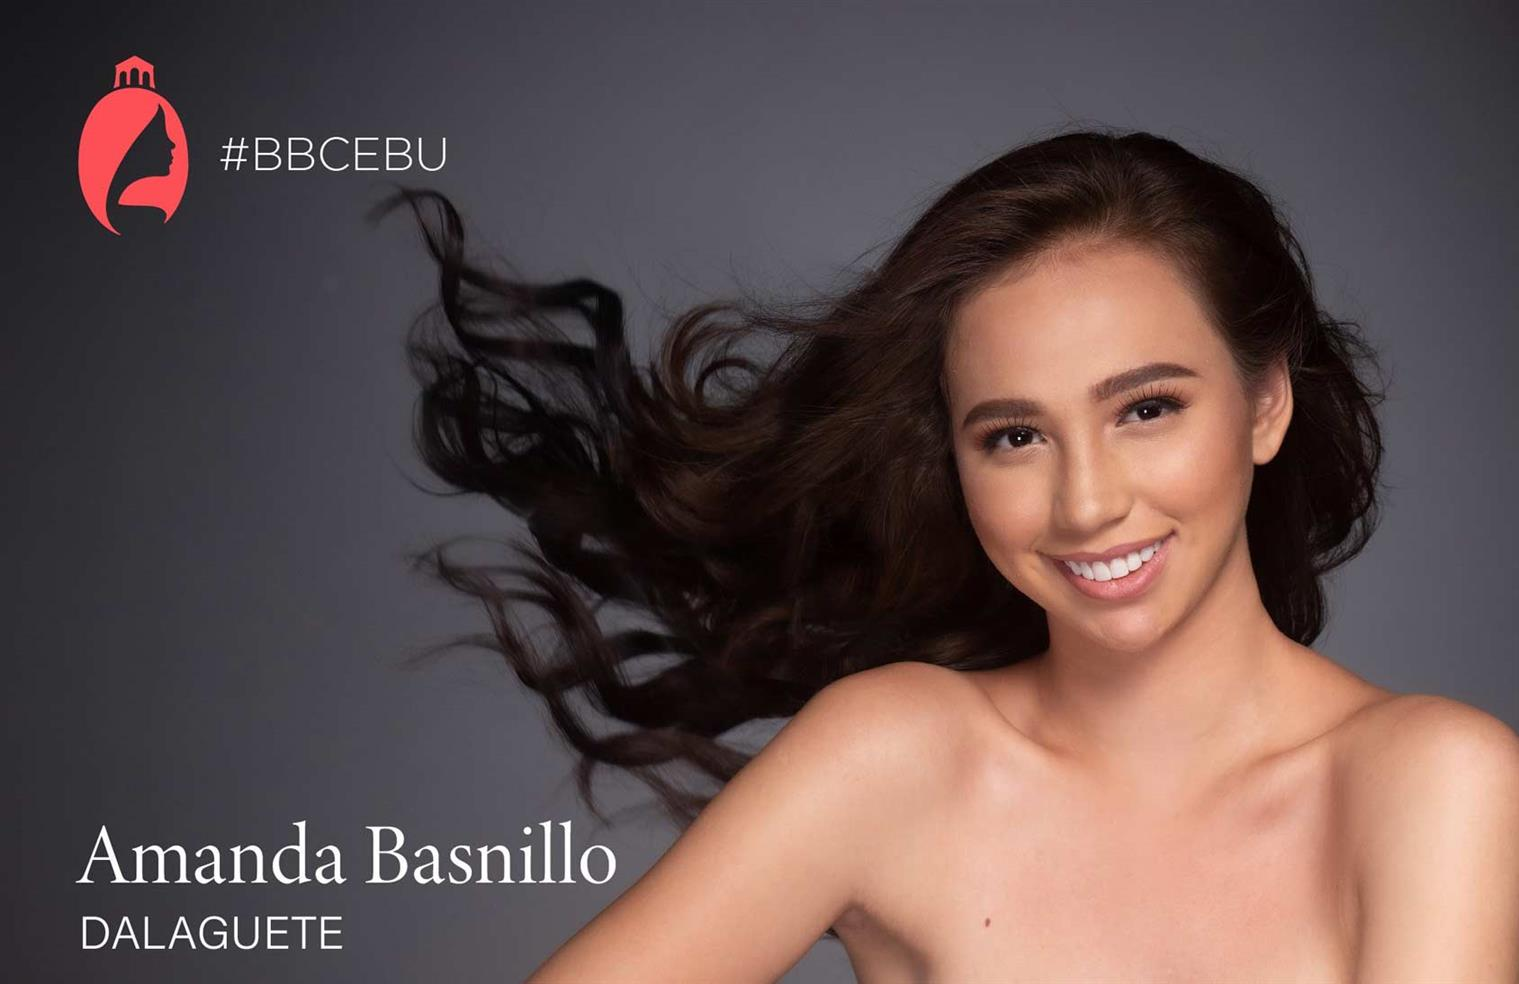 Amanda Basnillo representing Dalaguete